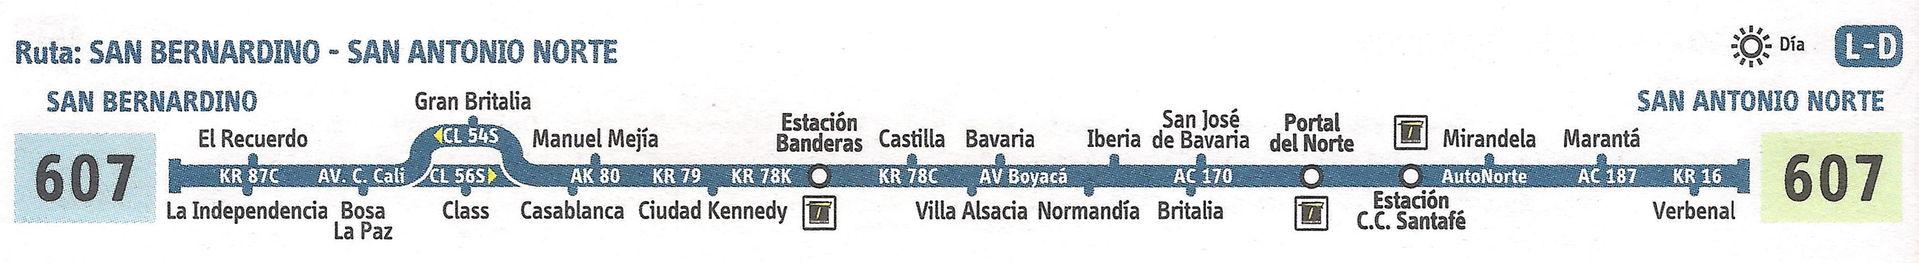 Ruta SITP: 607 Bosa, La Independencia ↔ San Antonio Norte [Urbana] 4